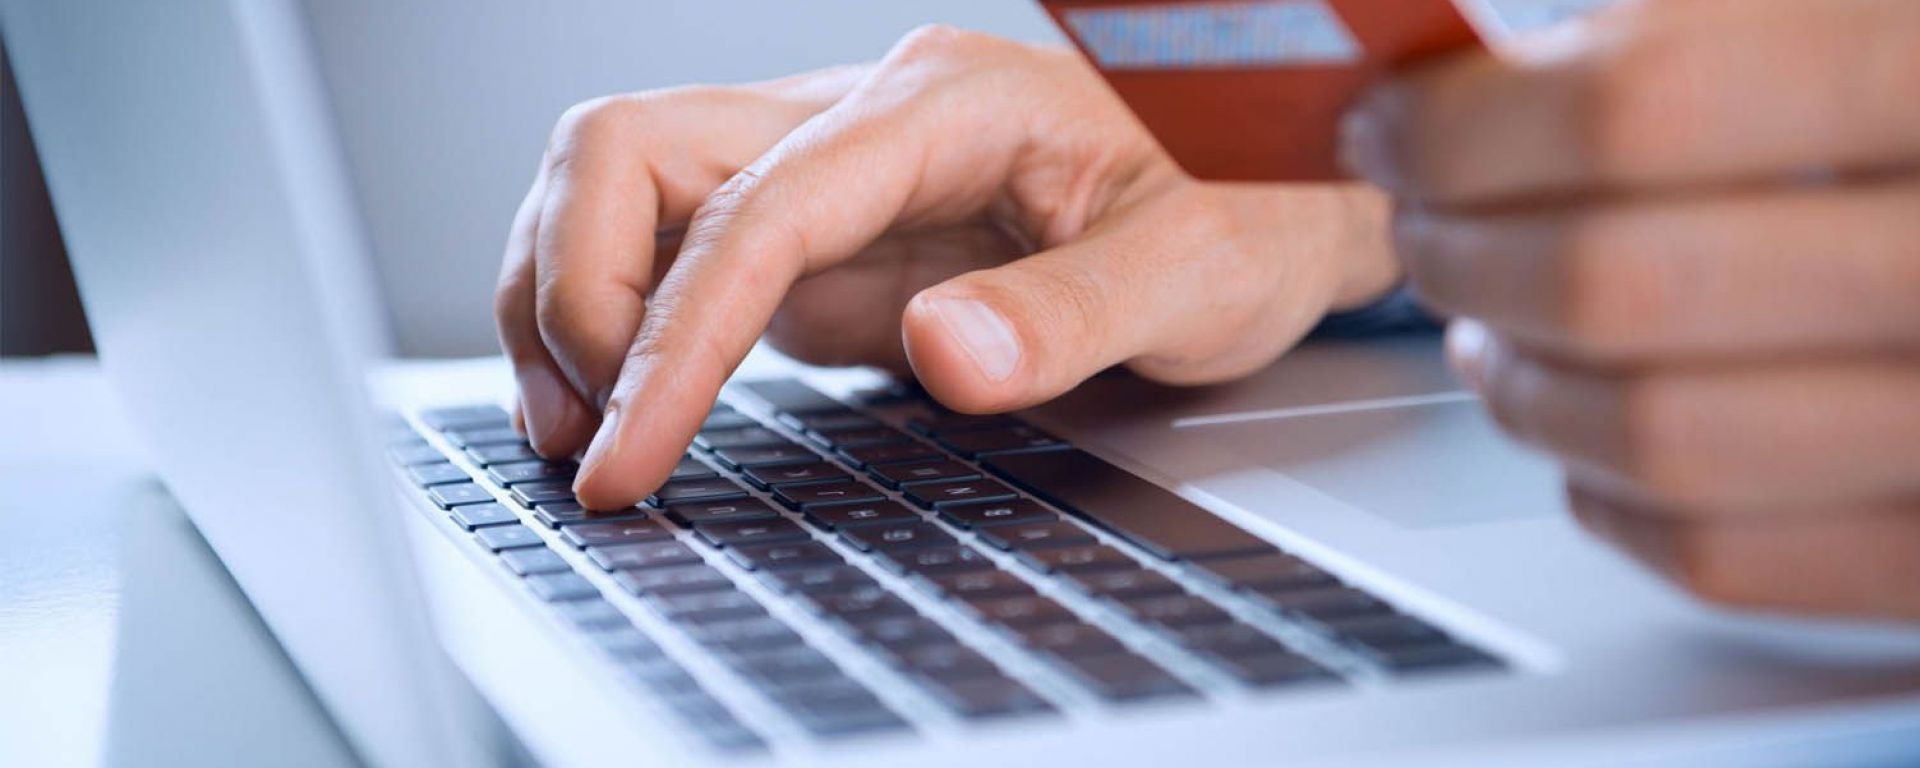 Multe, dal 2020 recapitate online?